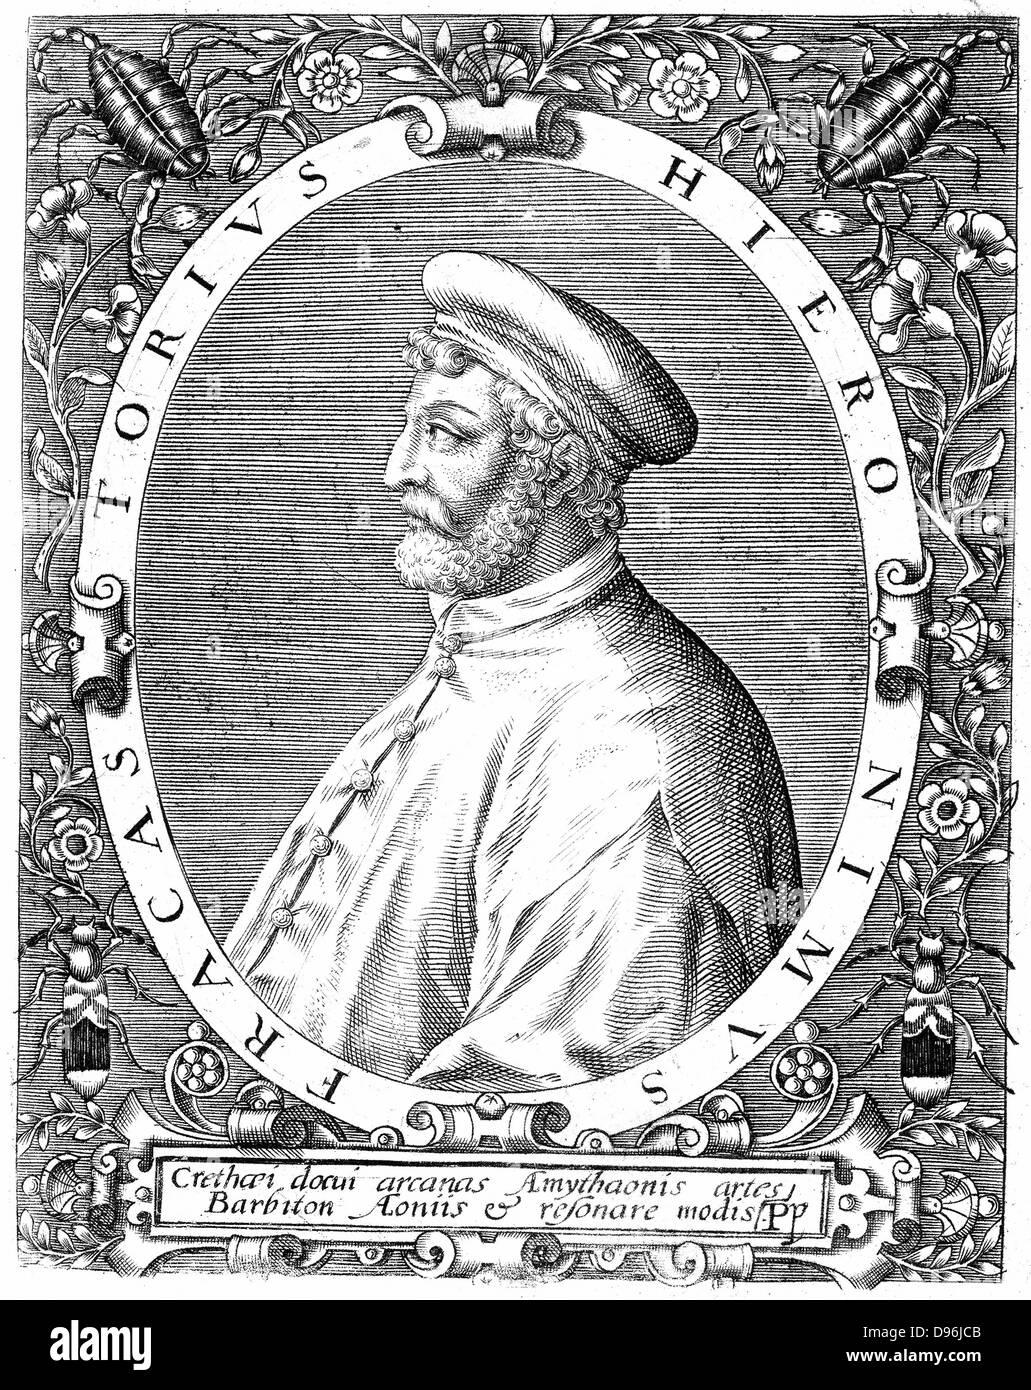 Girolamo Frascatoro Fracastorius (Hieronymus) c1478-1553. Médecin italien, poète et astronome. Théorie Photo Stock